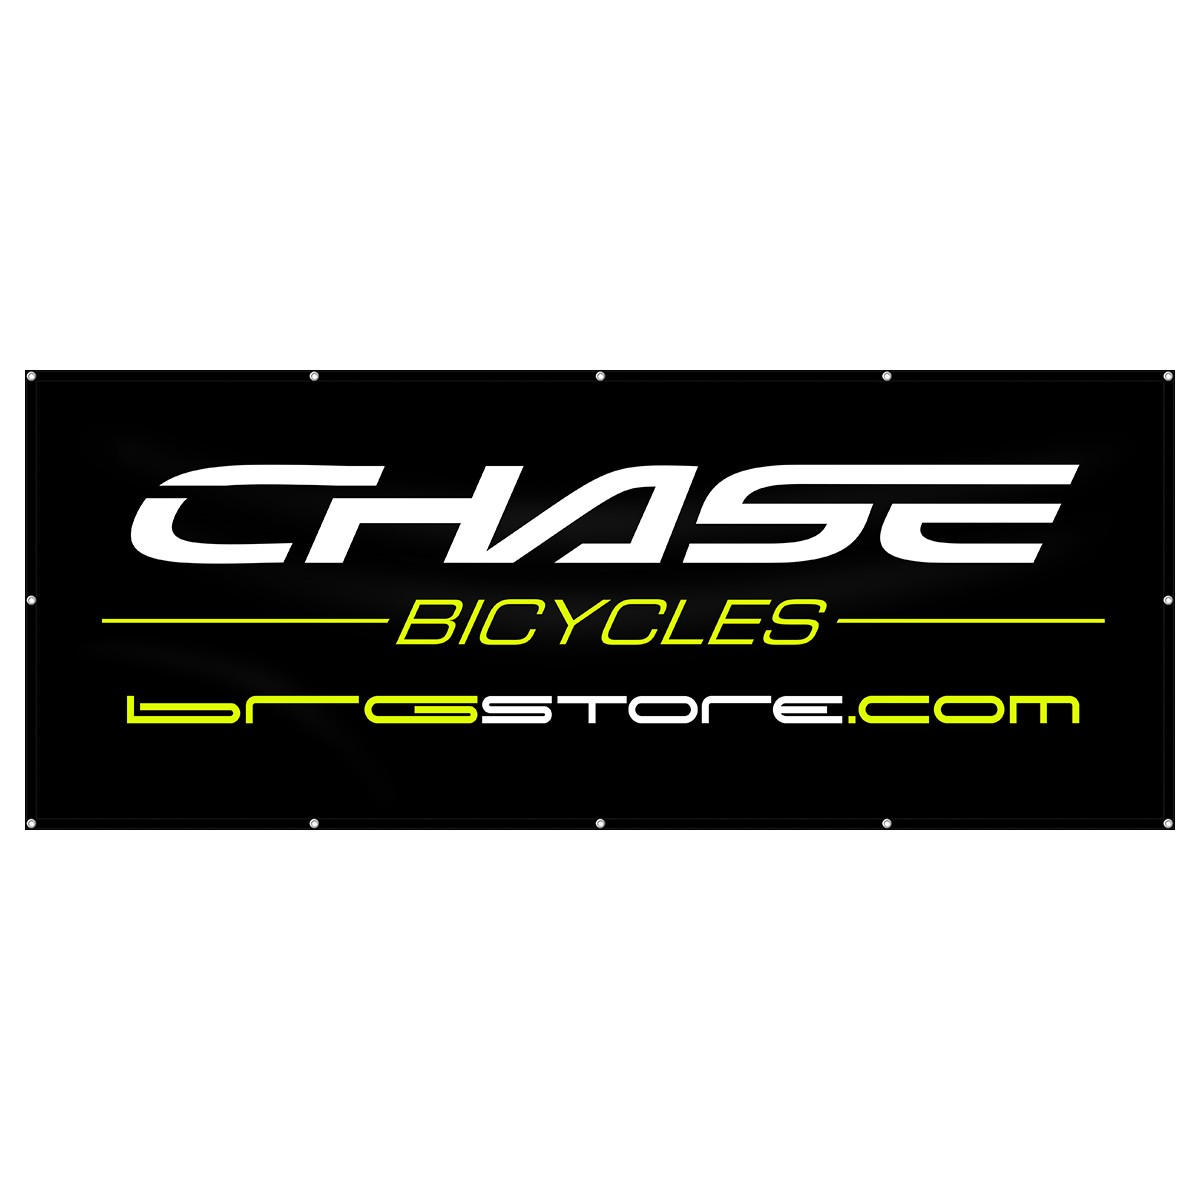 CHASE / BRG STORE BANNER 8x3ft BLACK